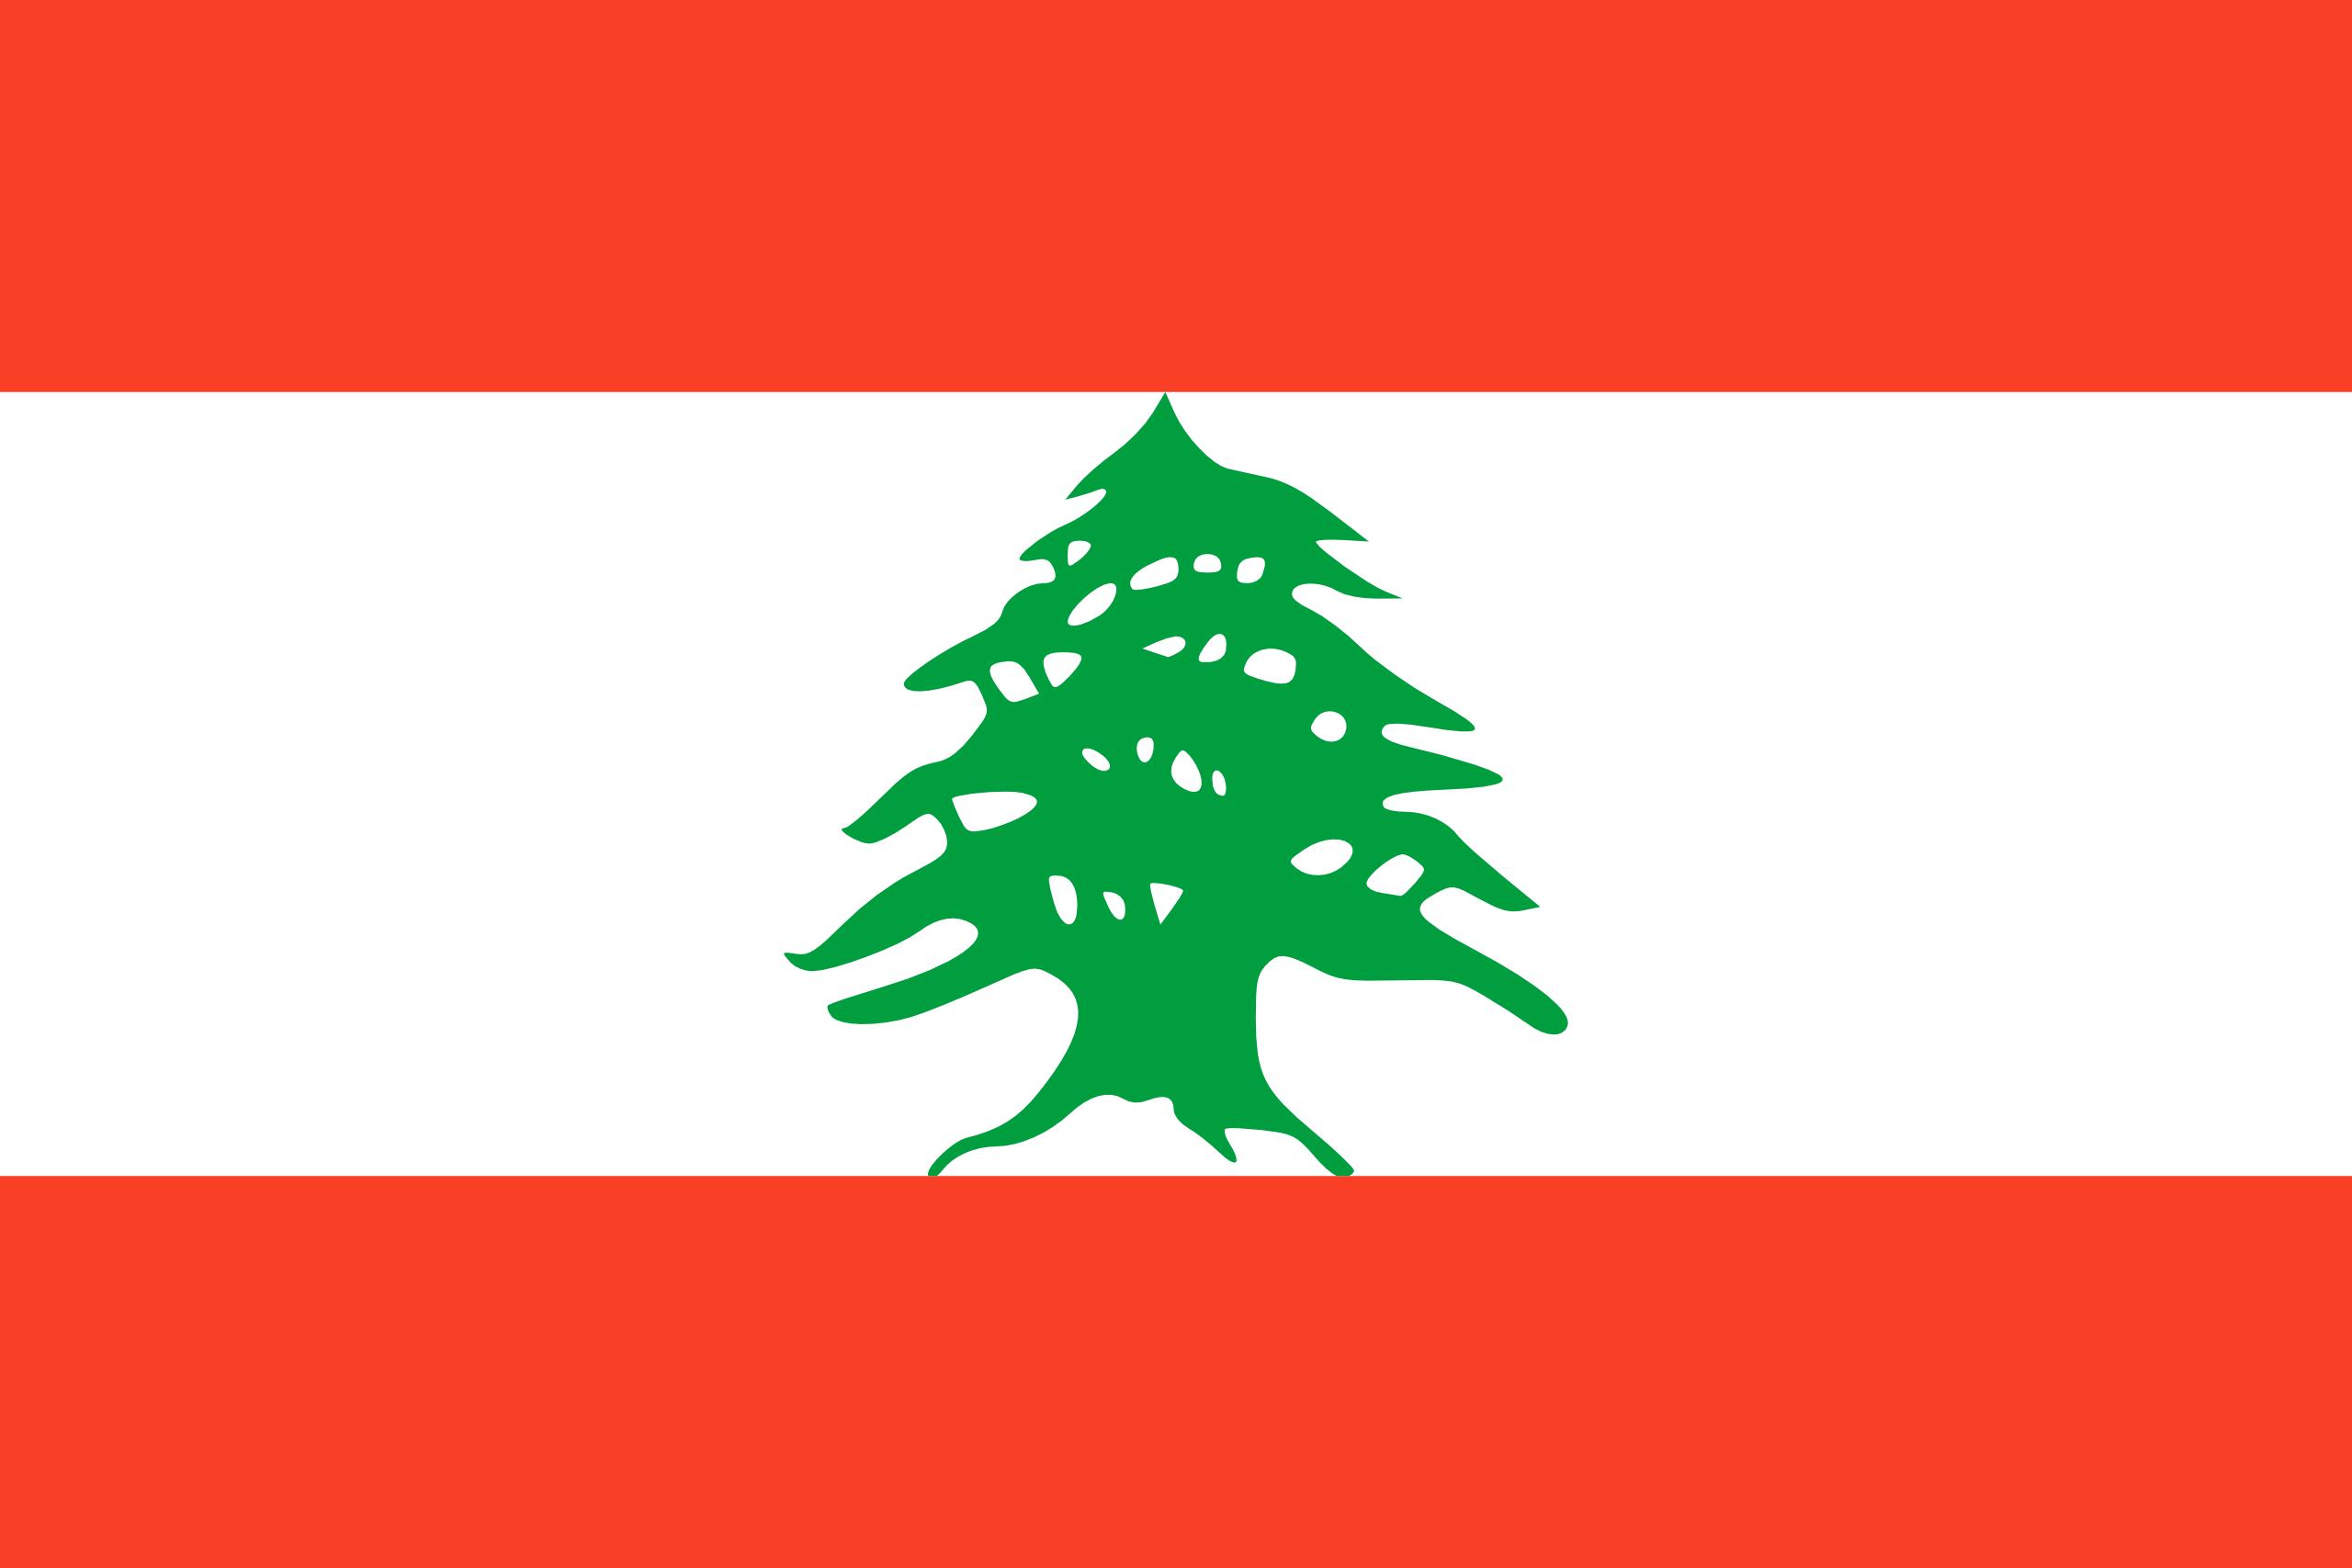 líbano, 国家, 会徽, 徽标, 符号 - 高清壁纸 - 教授-falken.com